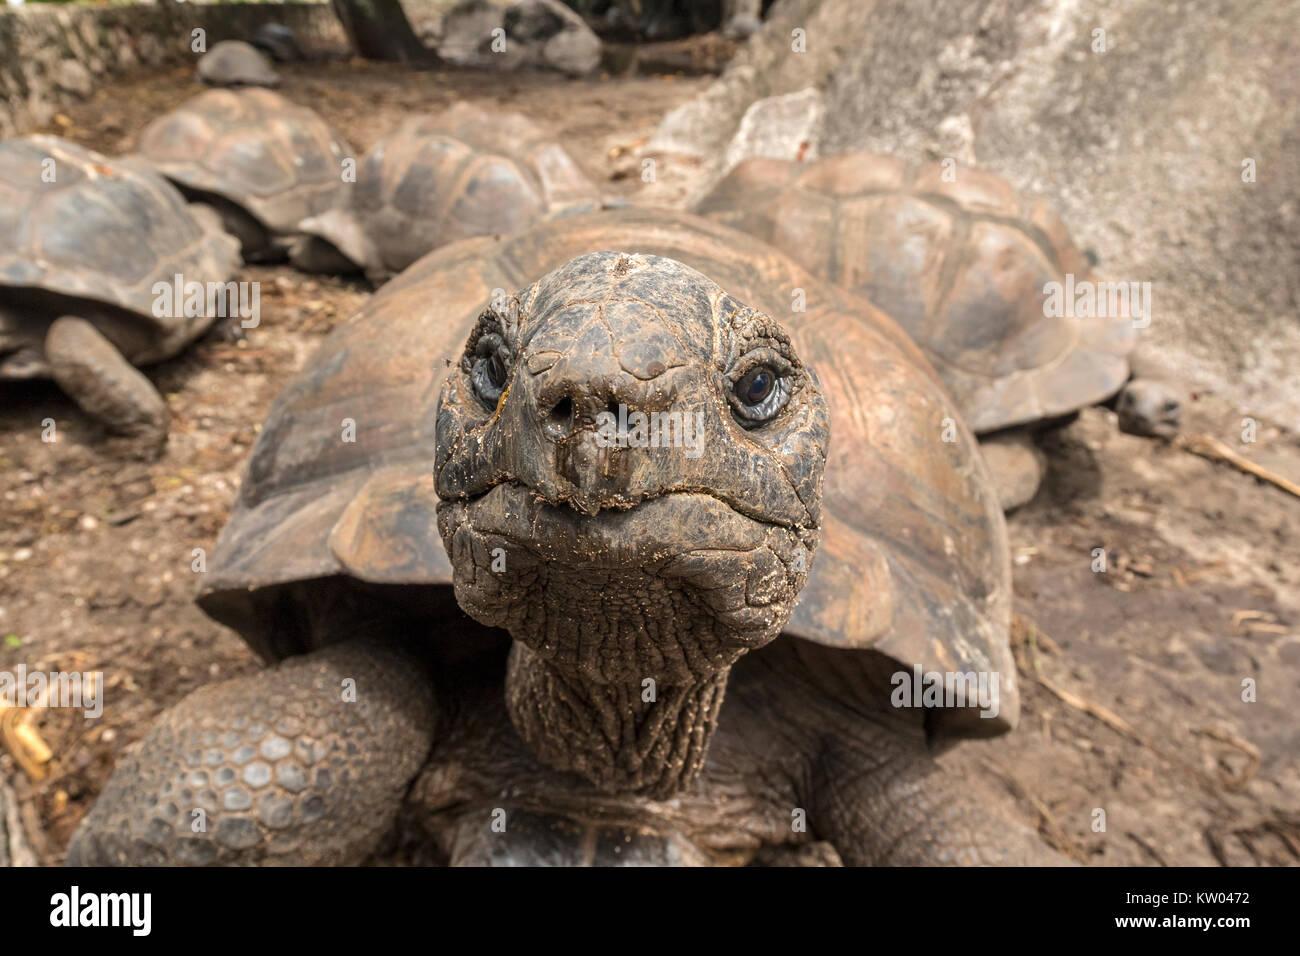 Aldabra giant tortoise (Aldabrachelys gigantea), Testudinidae. L'Union Estate Farm - Stock Image